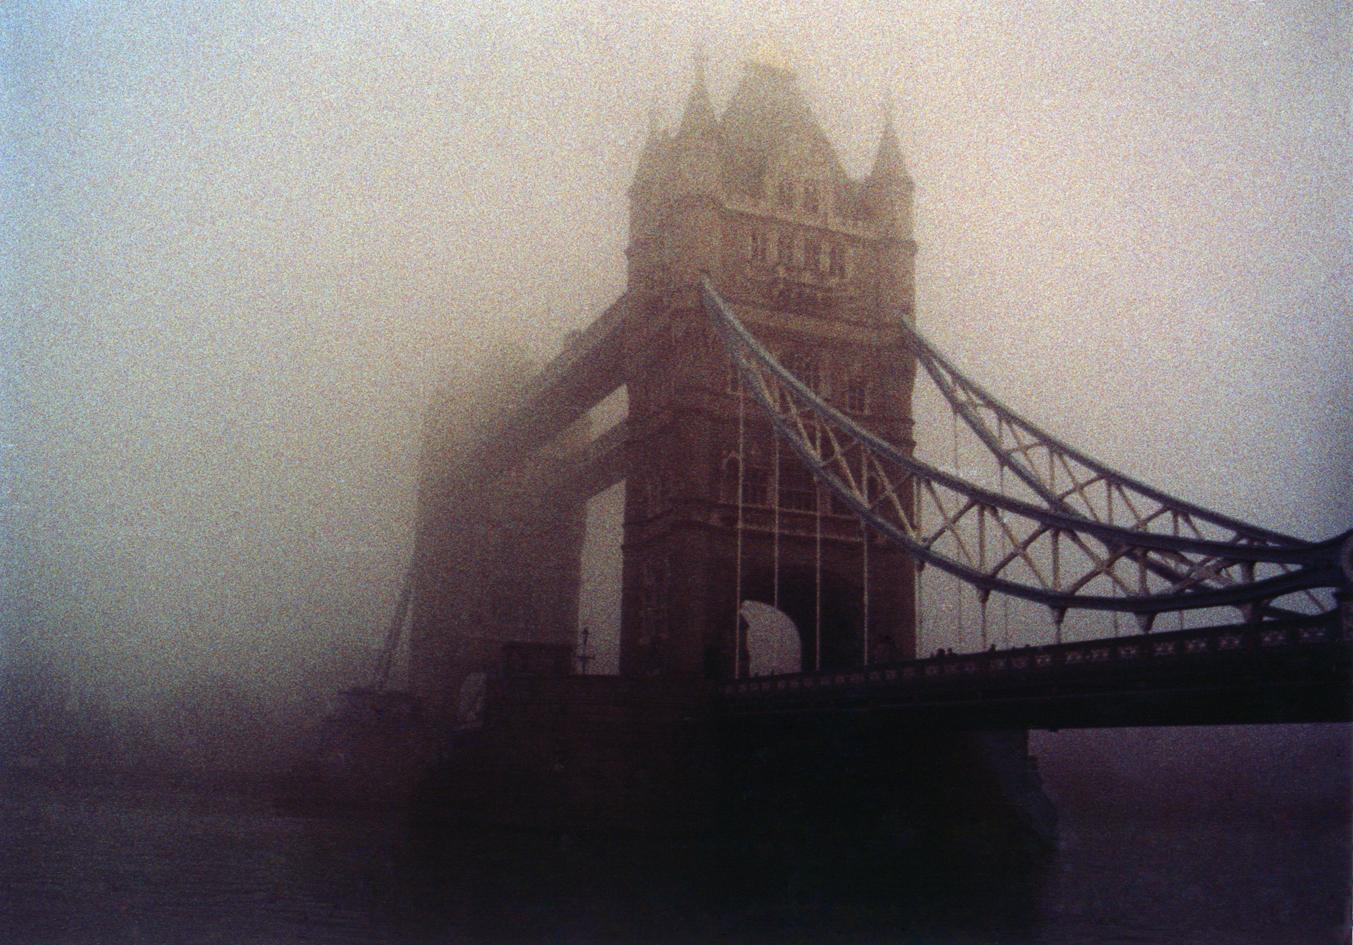 Fog over Towerbridge